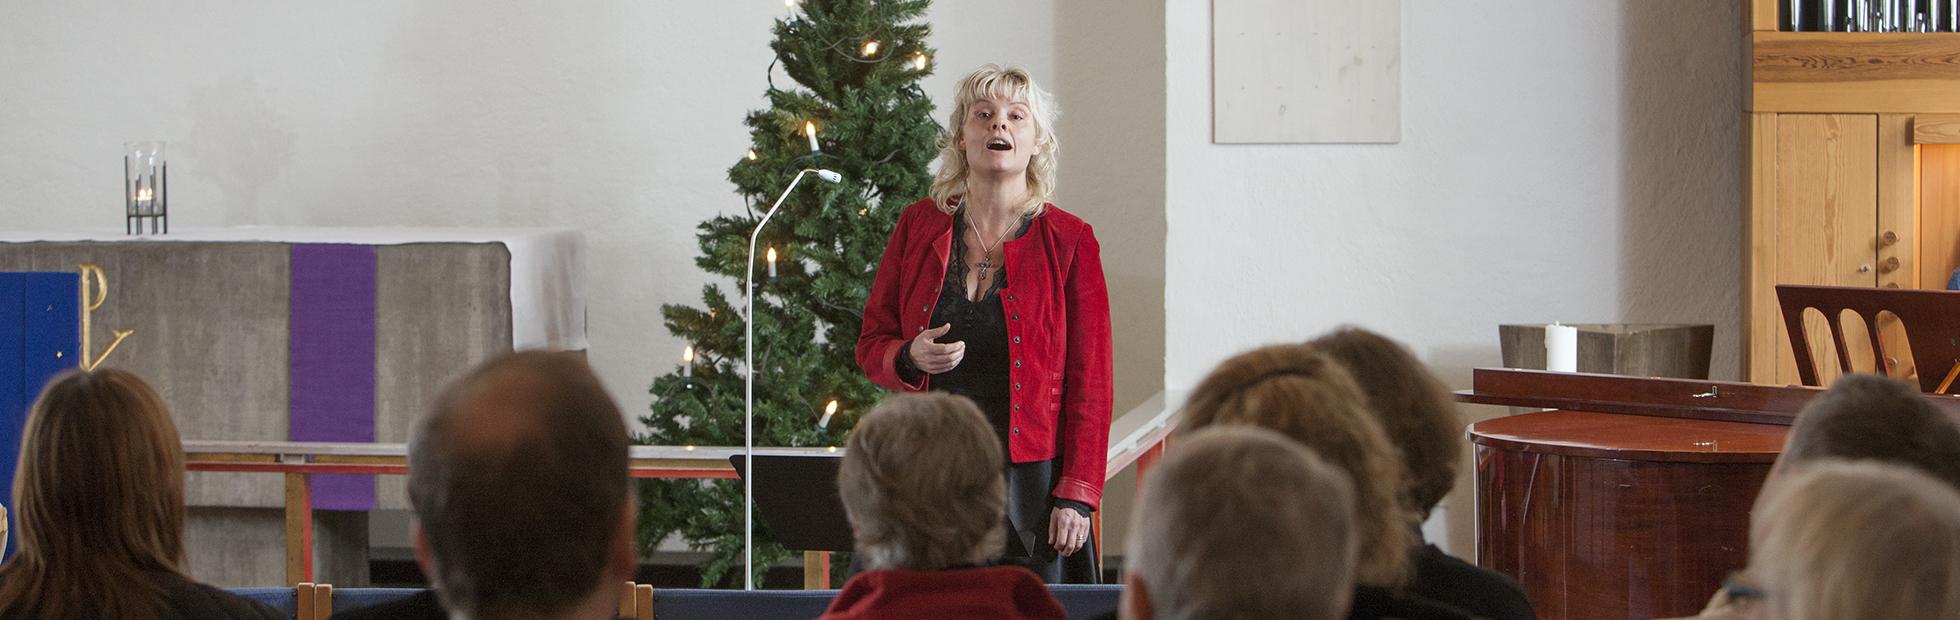 Christina Froh sjunger julsånger i Högåskyrkan i Tibro.